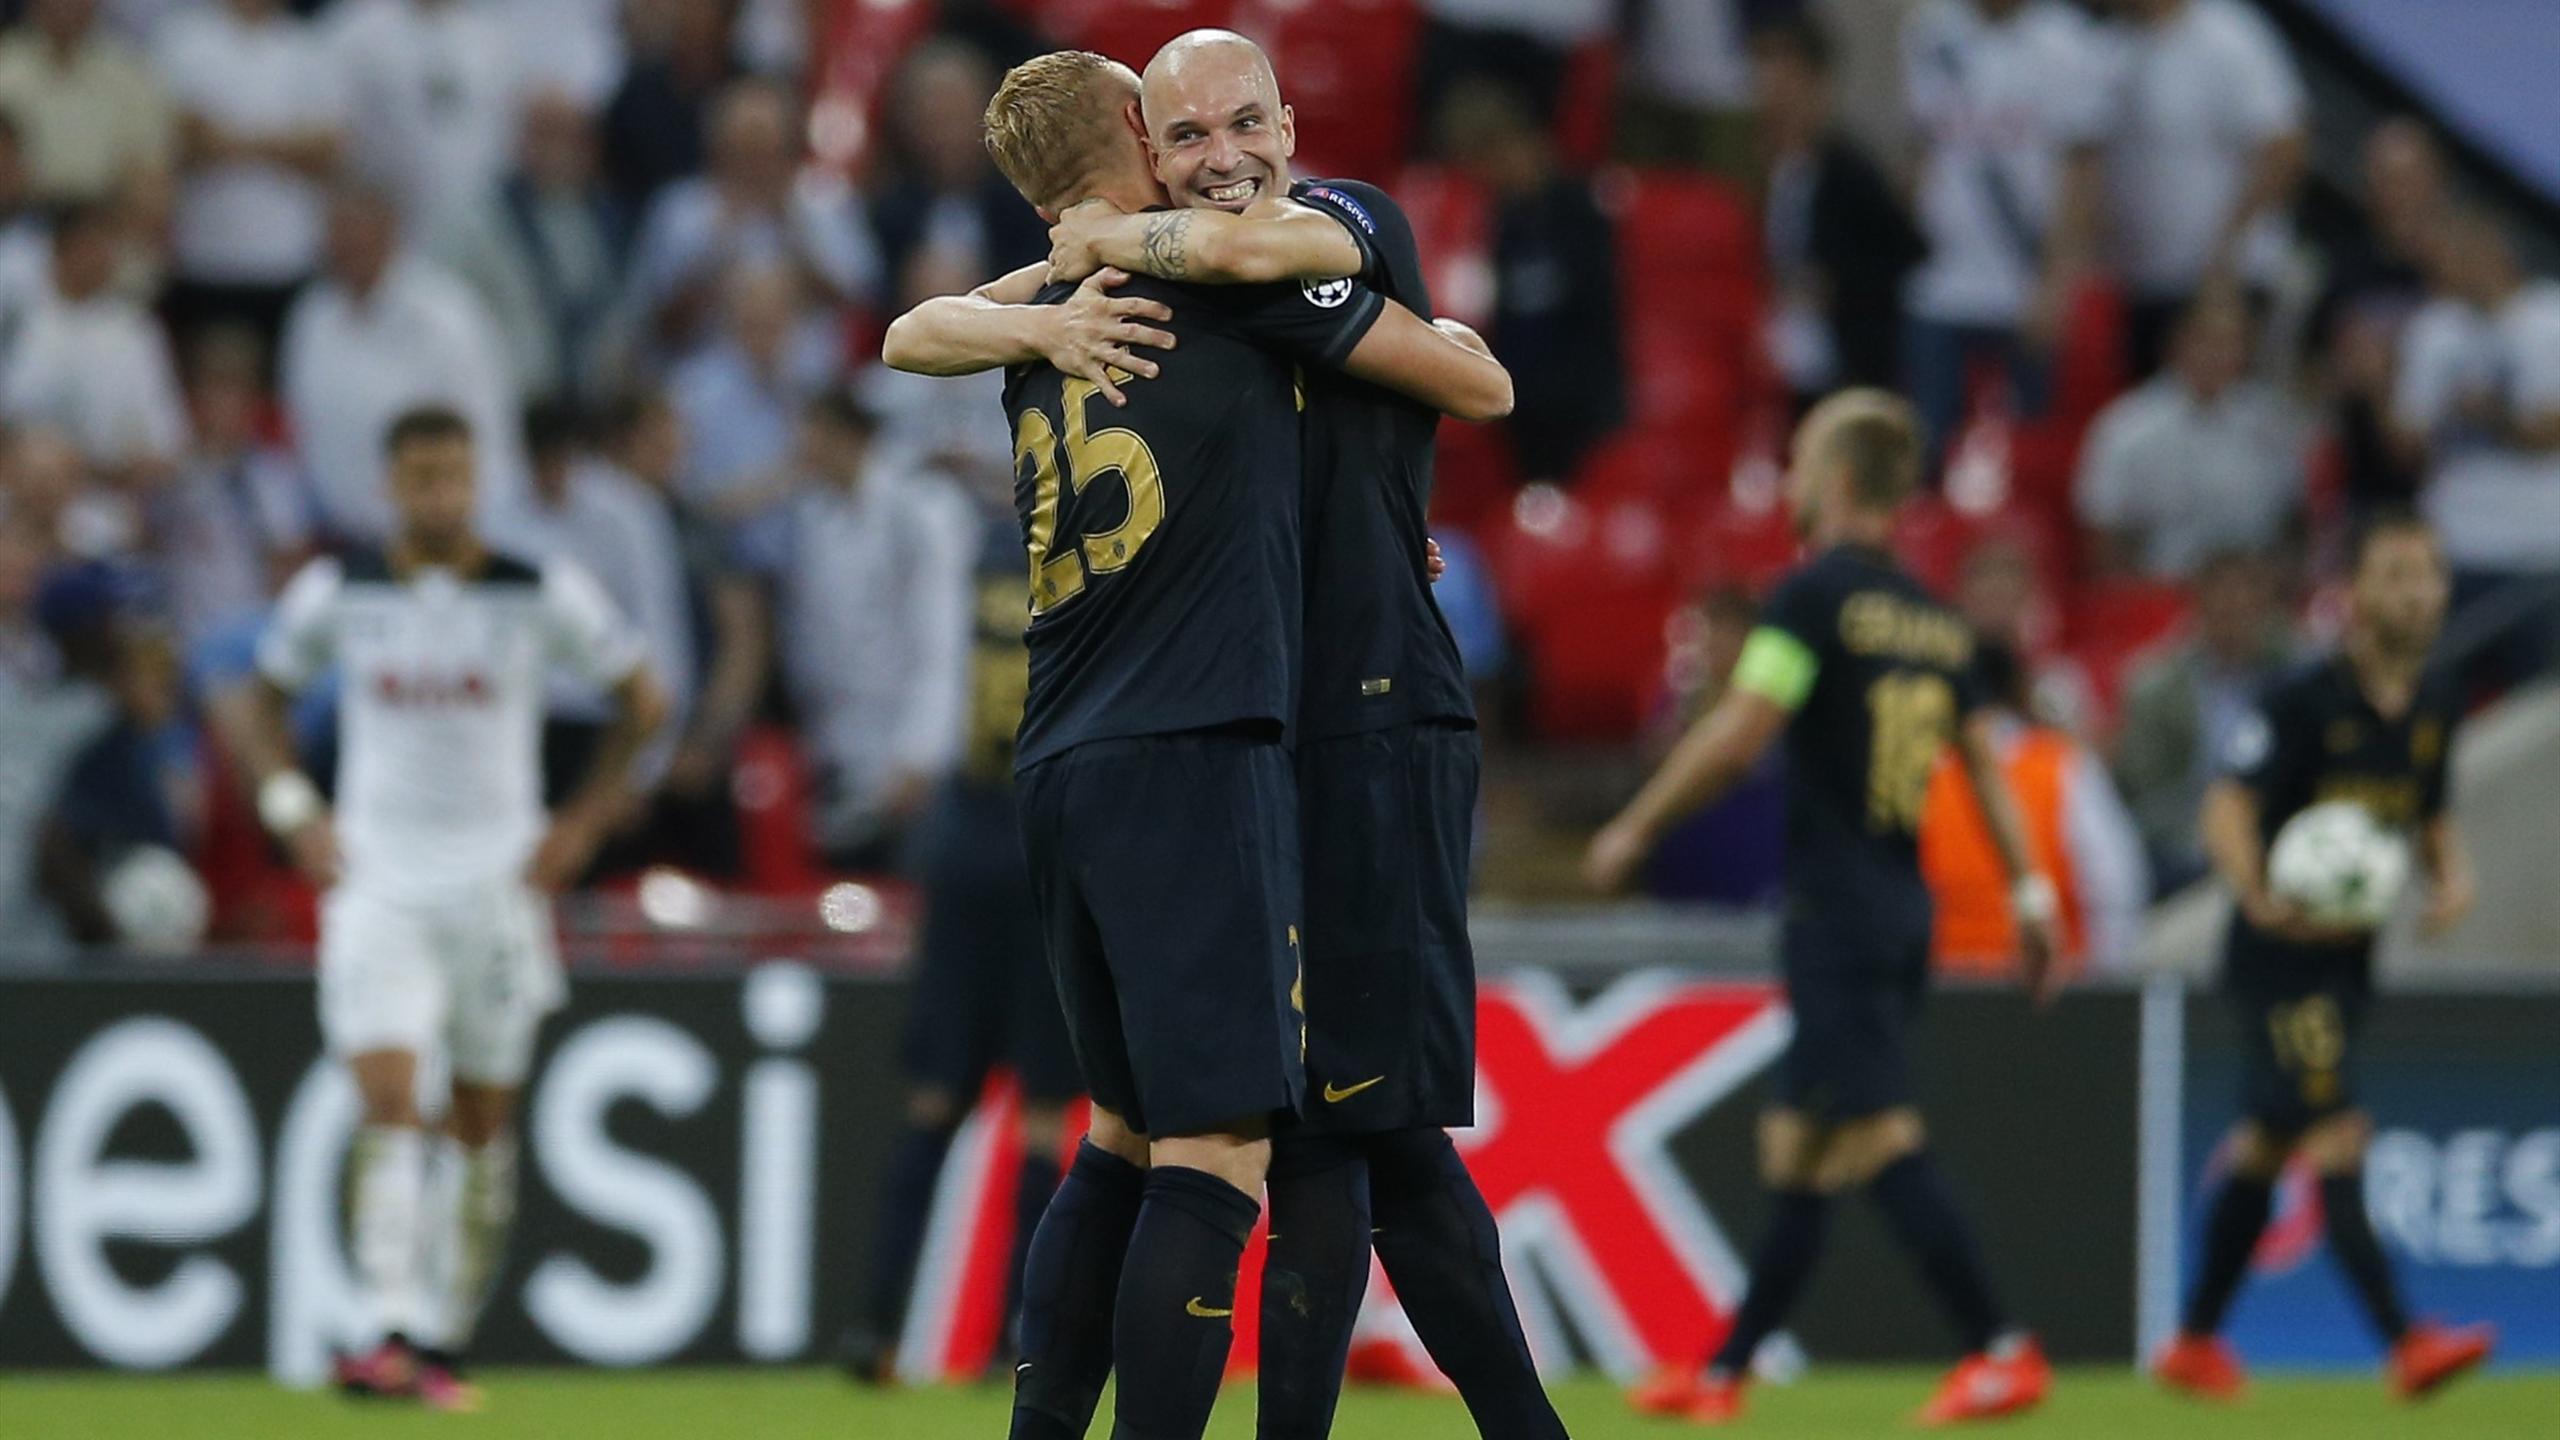 Raggi et Glik lors de la victoire de Monaco à Tottenham